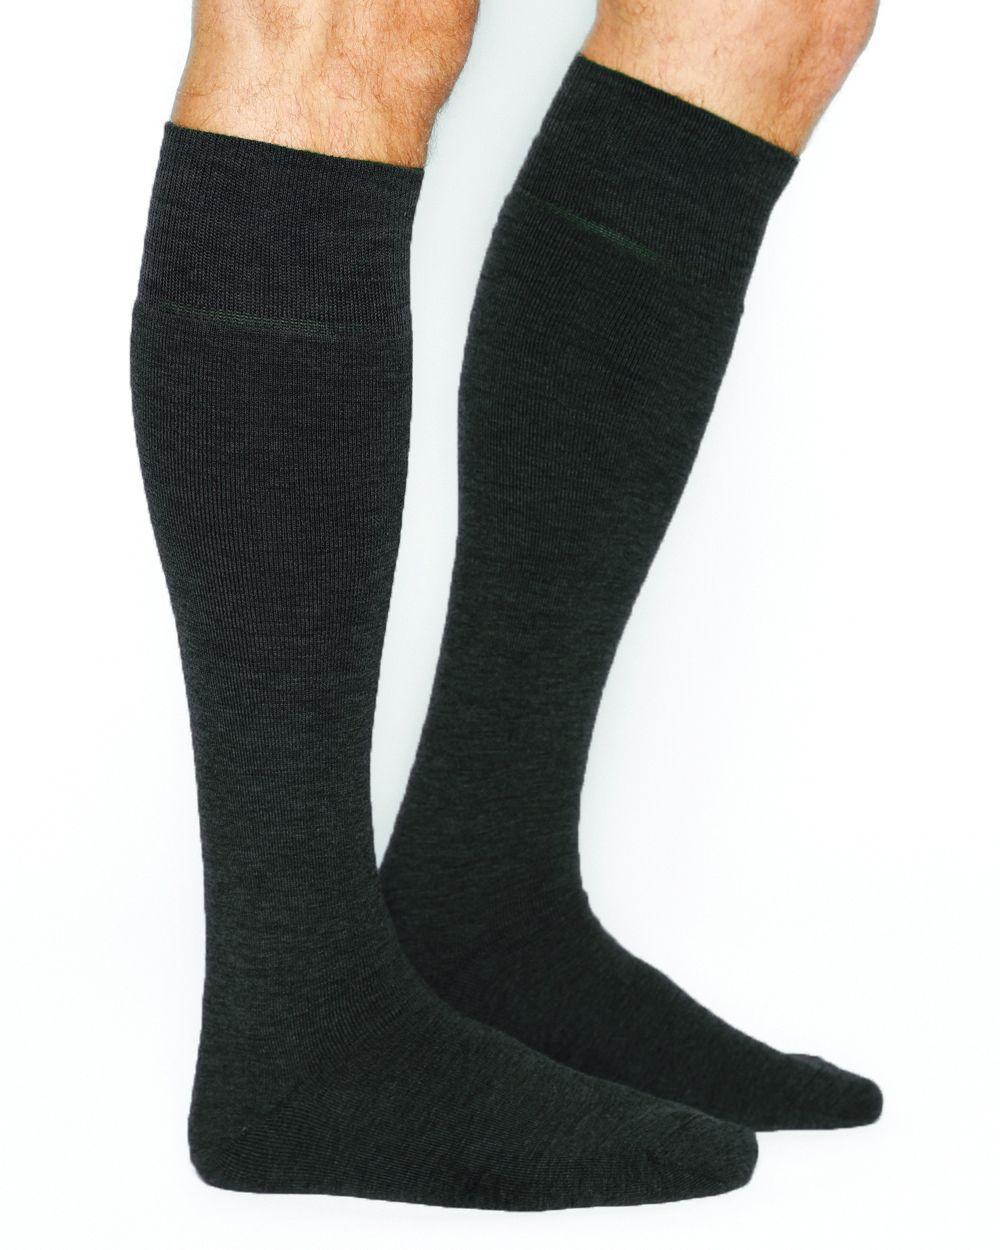 Rabbit pattern cotton socks